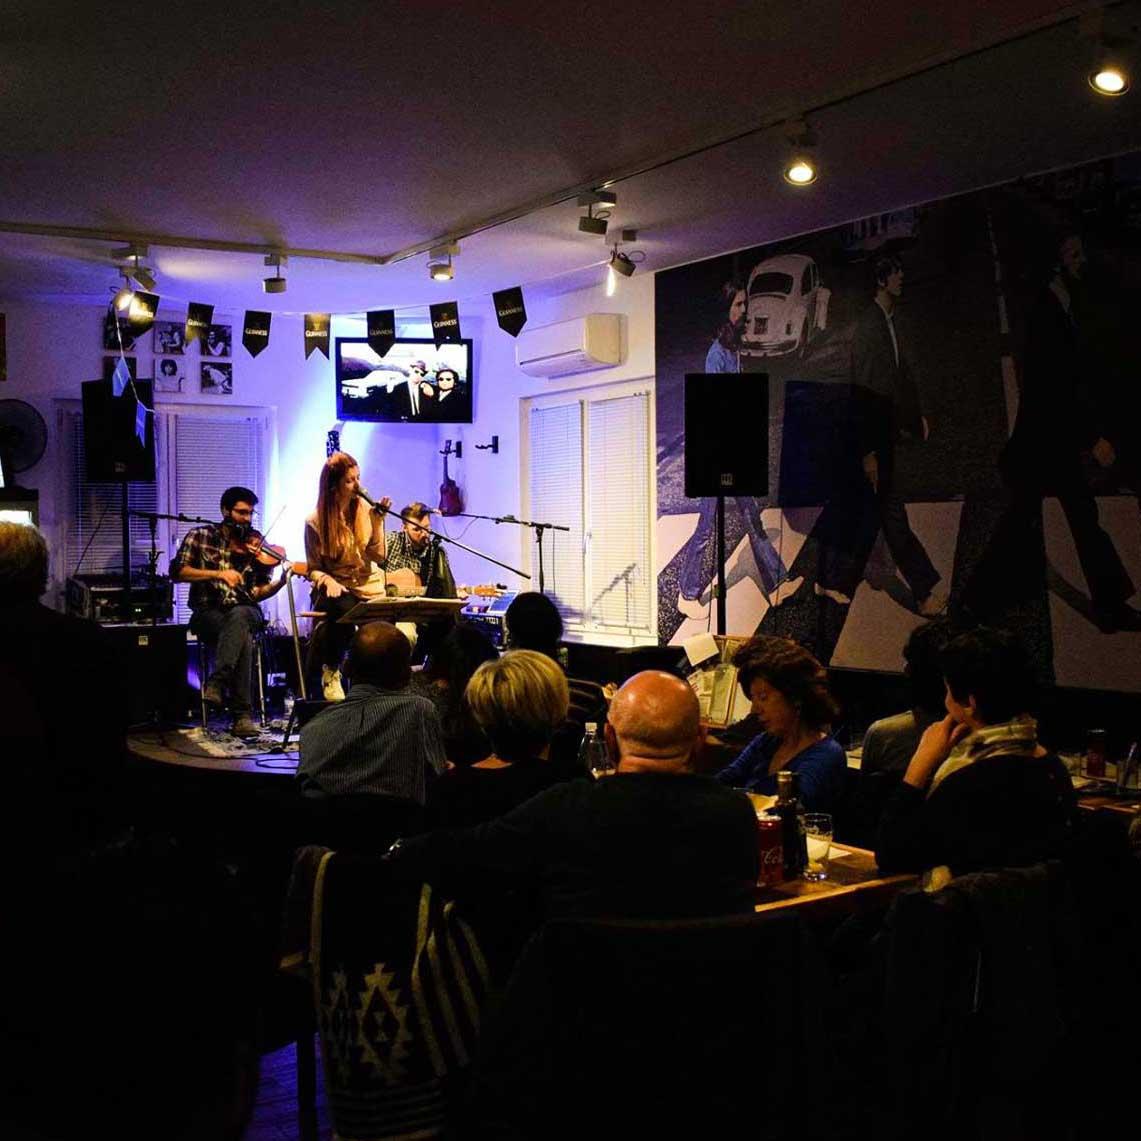 abbey road music club cervia 4